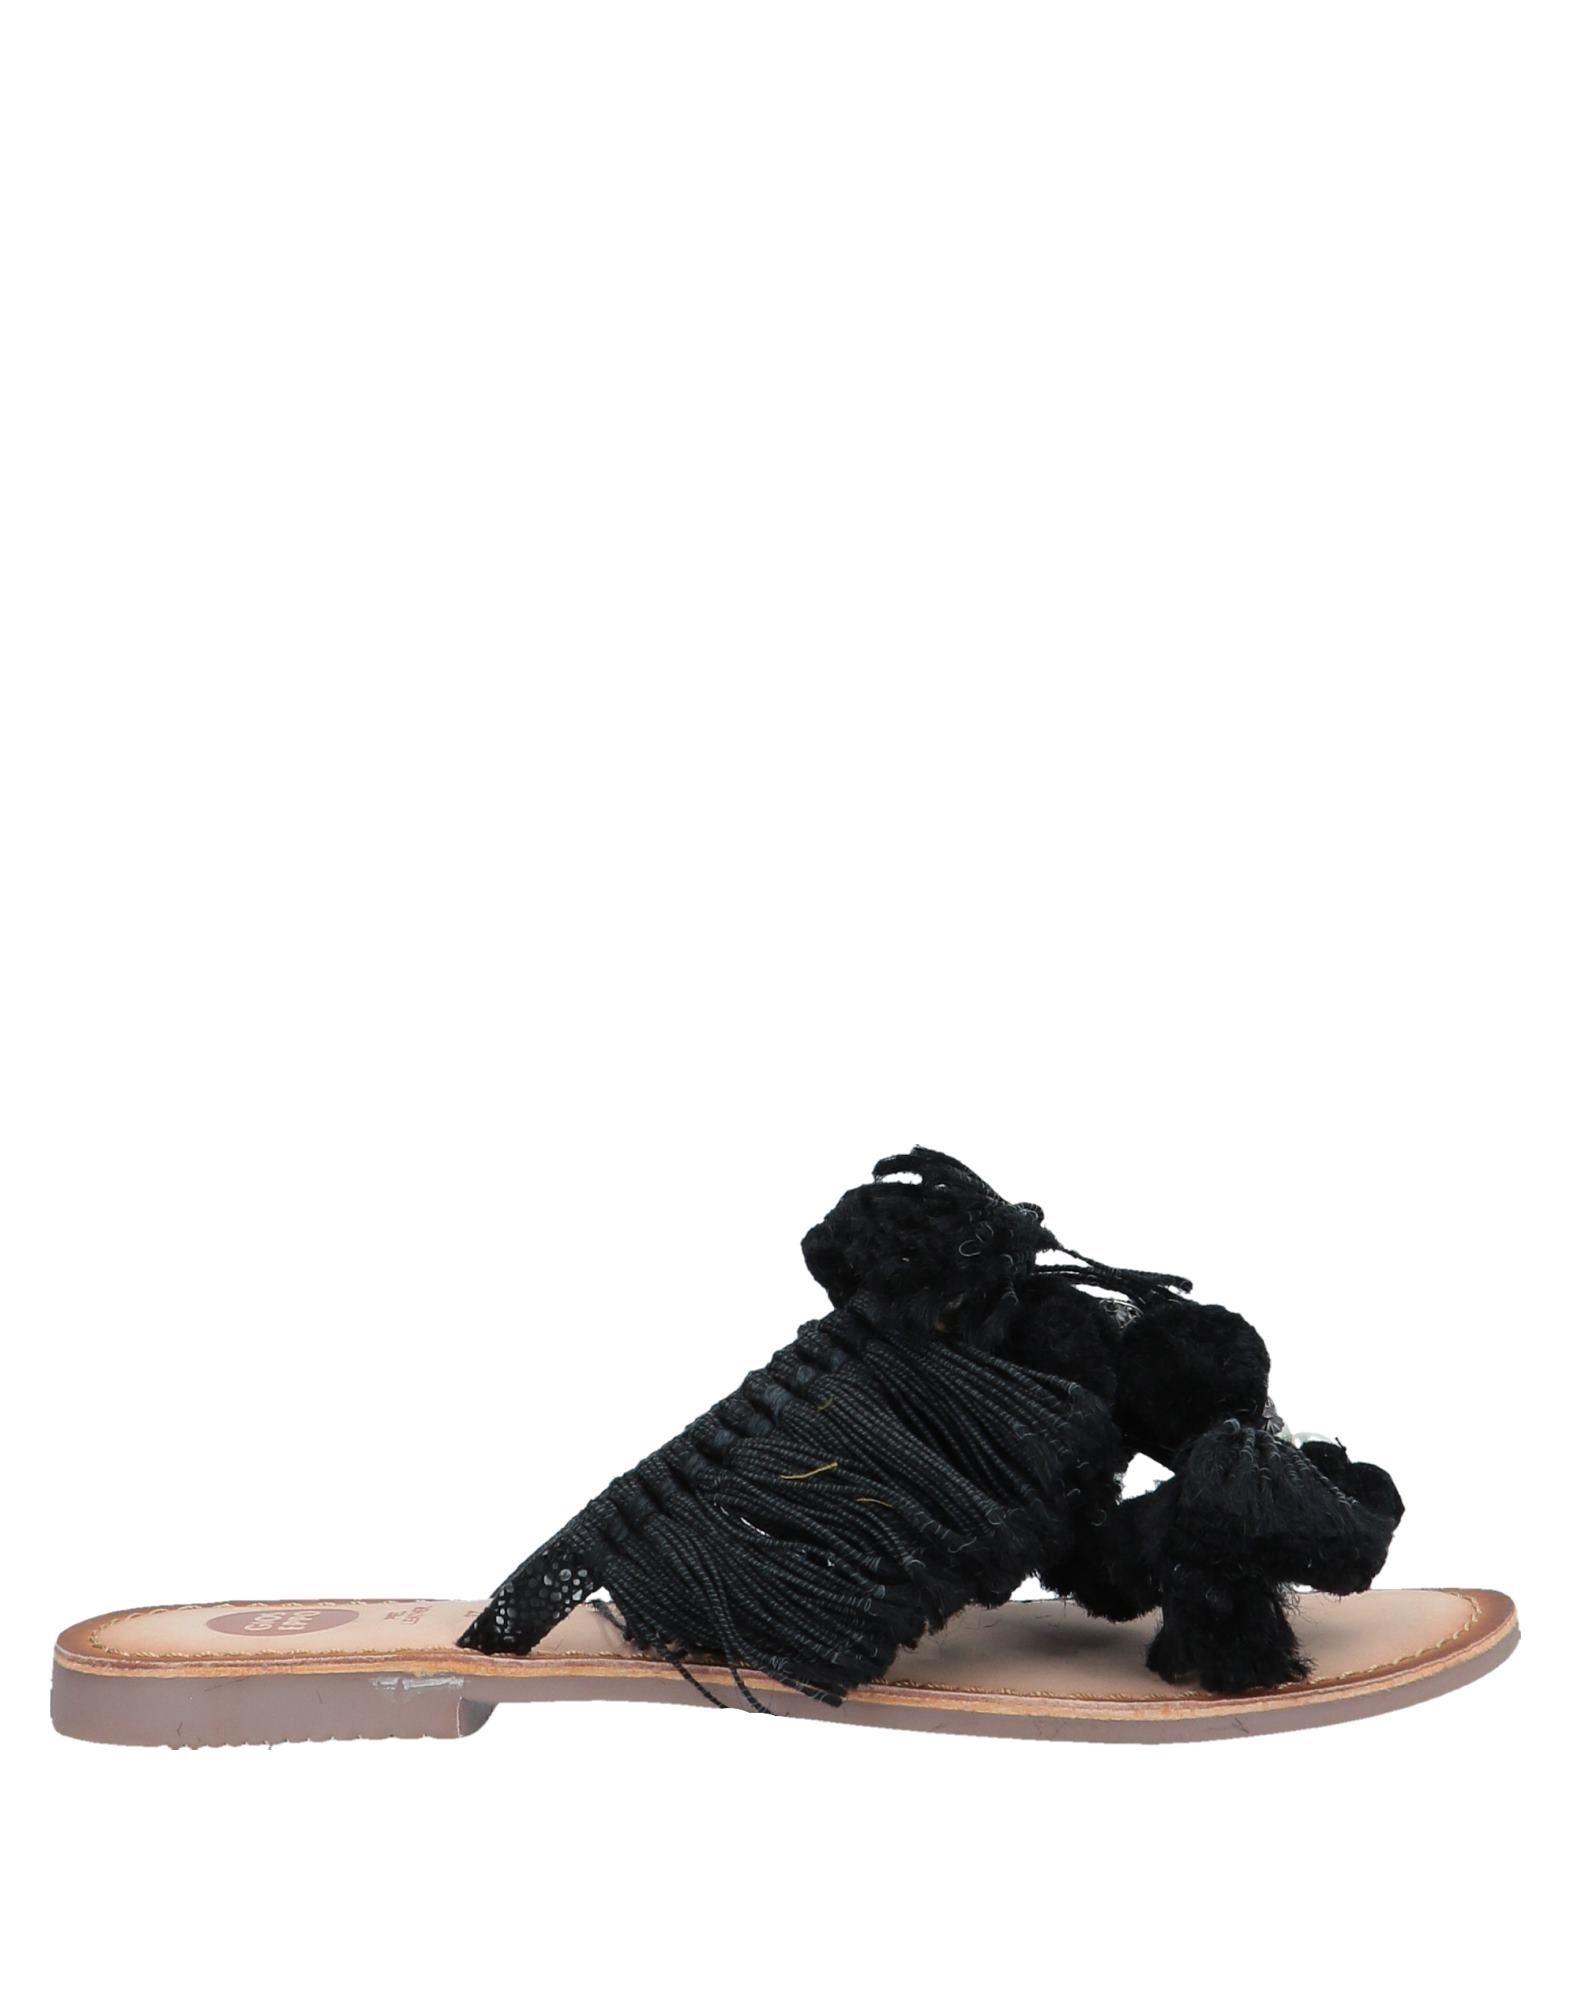 Gioseppo Dianetten Damen 11575836LO Gute Qualität beliebte Schuhe